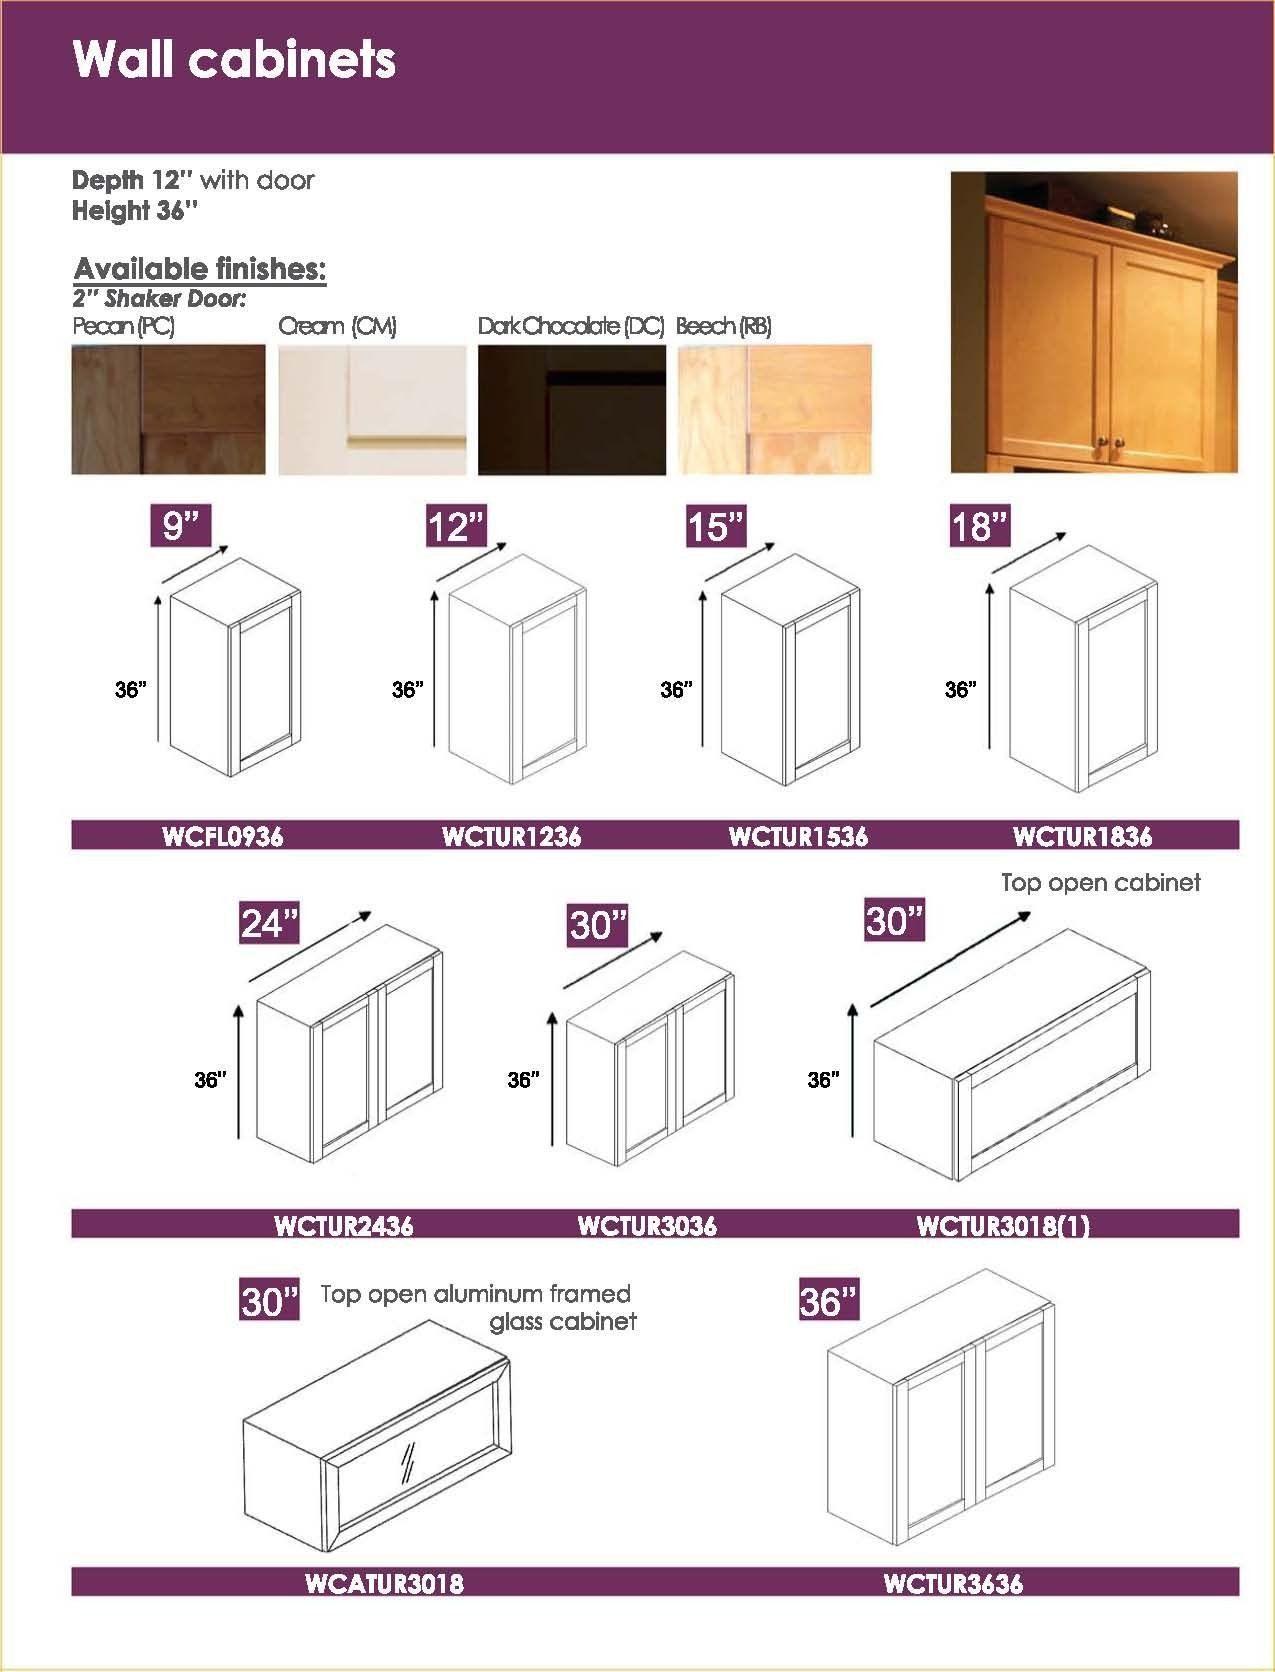 Standard Size Kitchen Cabinets In 2020 Kitchen Wall Cabinets Kitchen Cabinet Dimensions Kitchen Cabinet Sizes